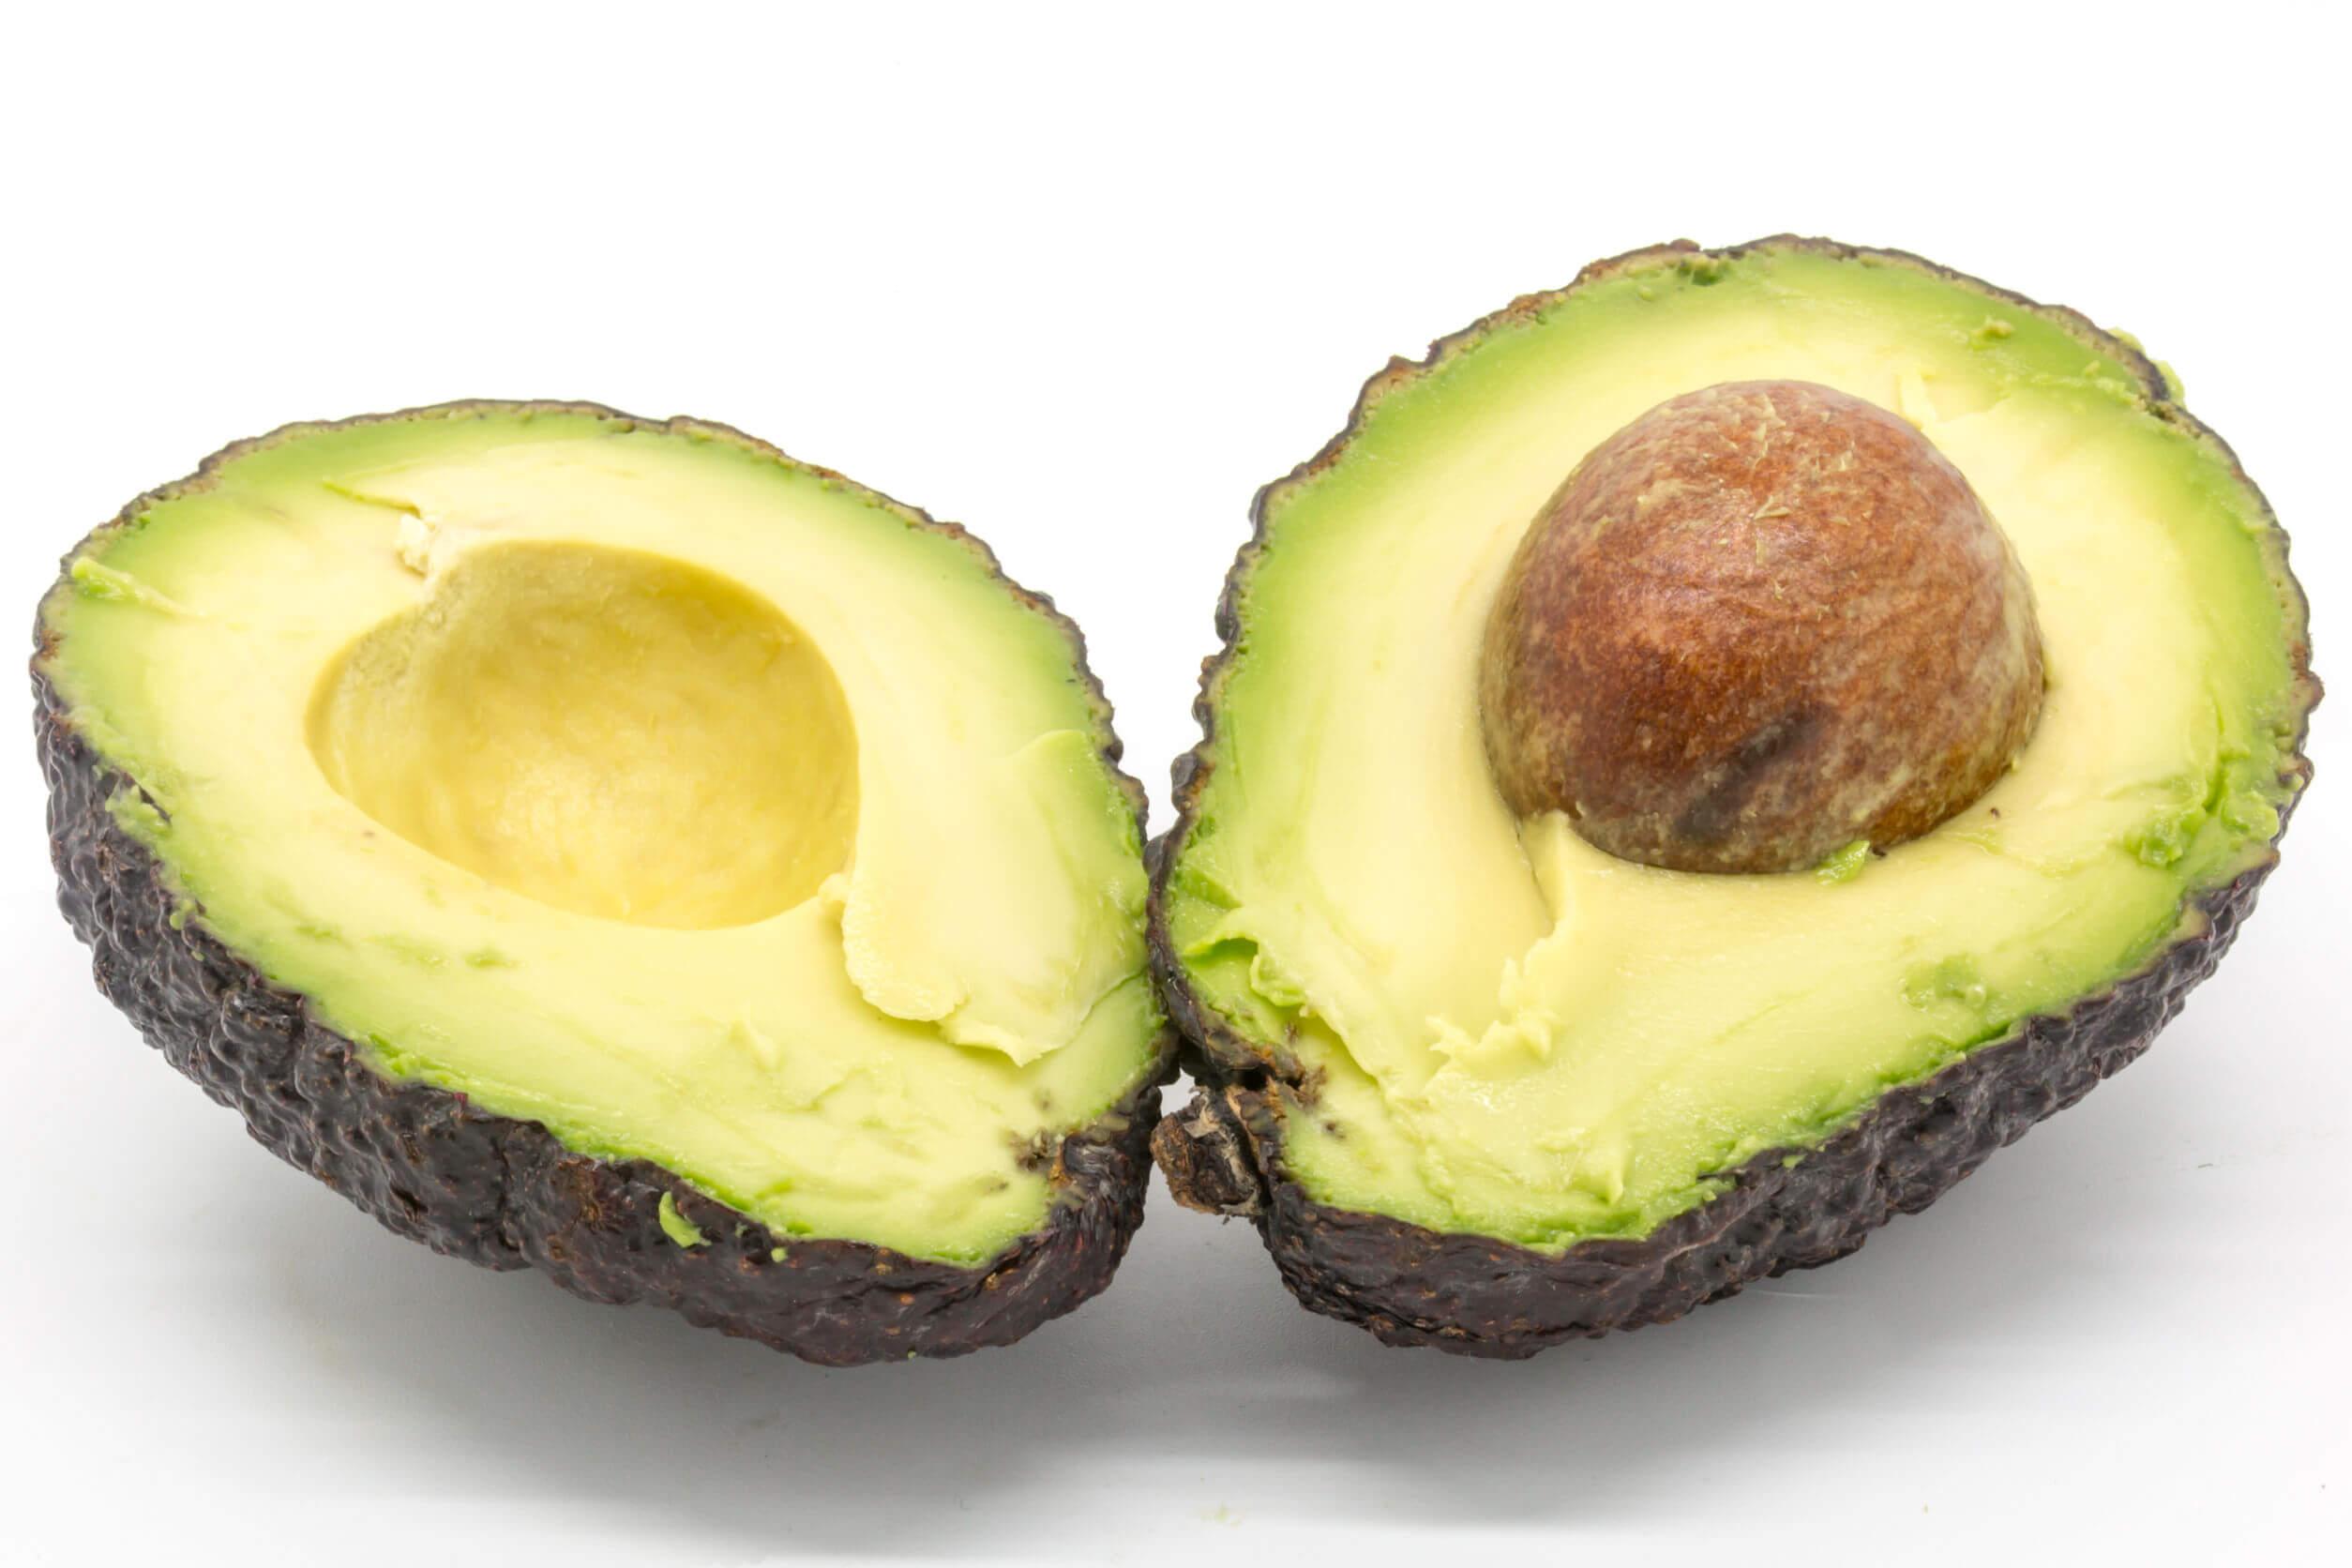 Comer fruta oxidada no resulta perjudicial.